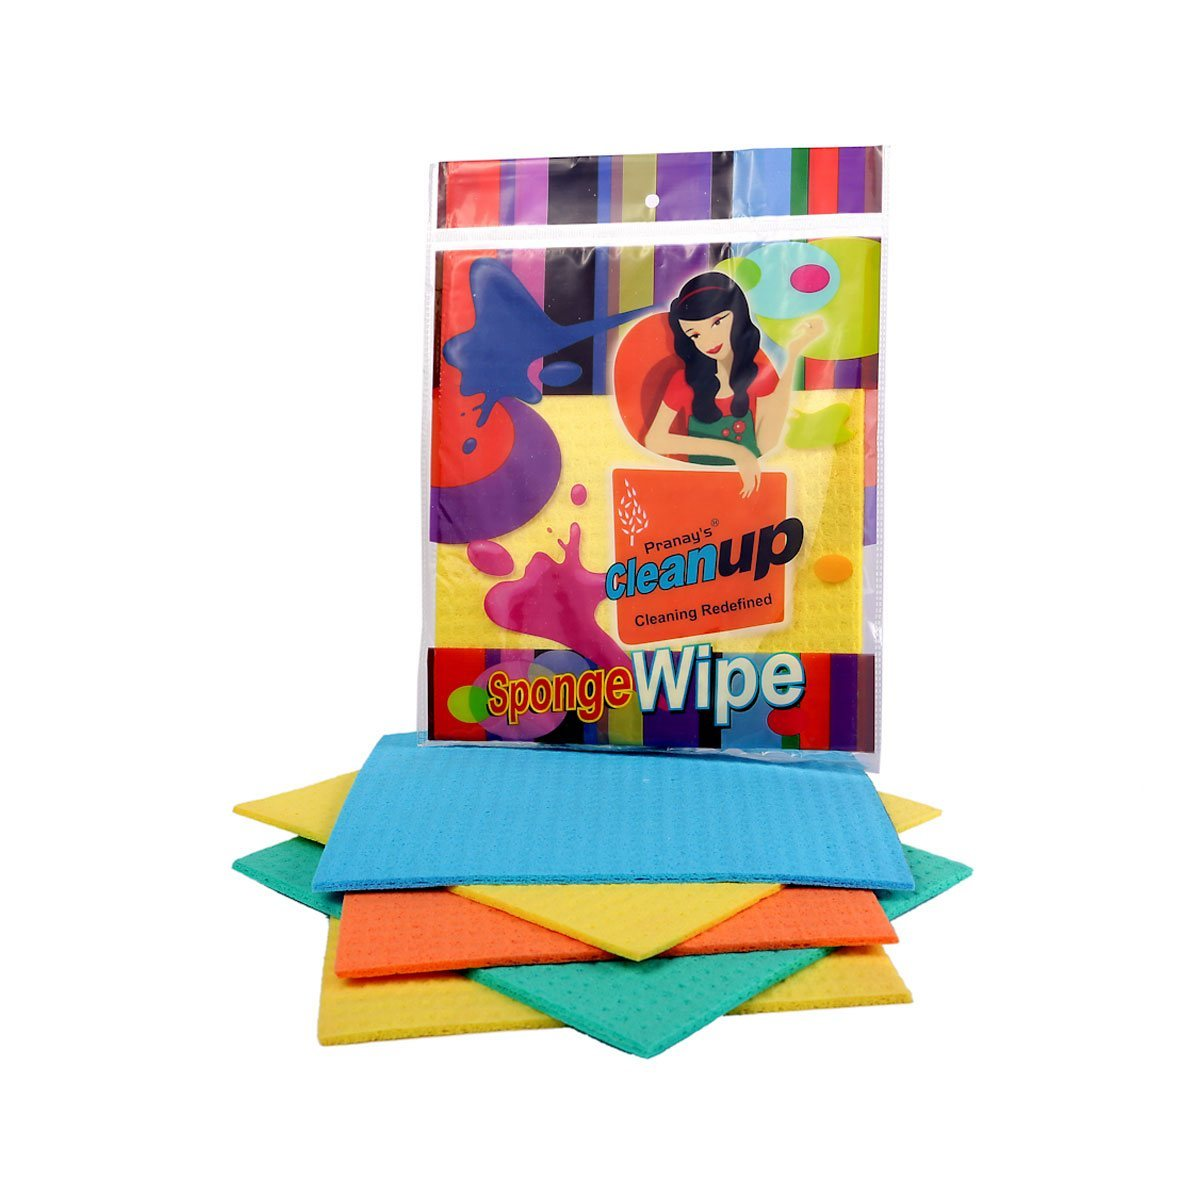 Kitchen Sponge Wipe